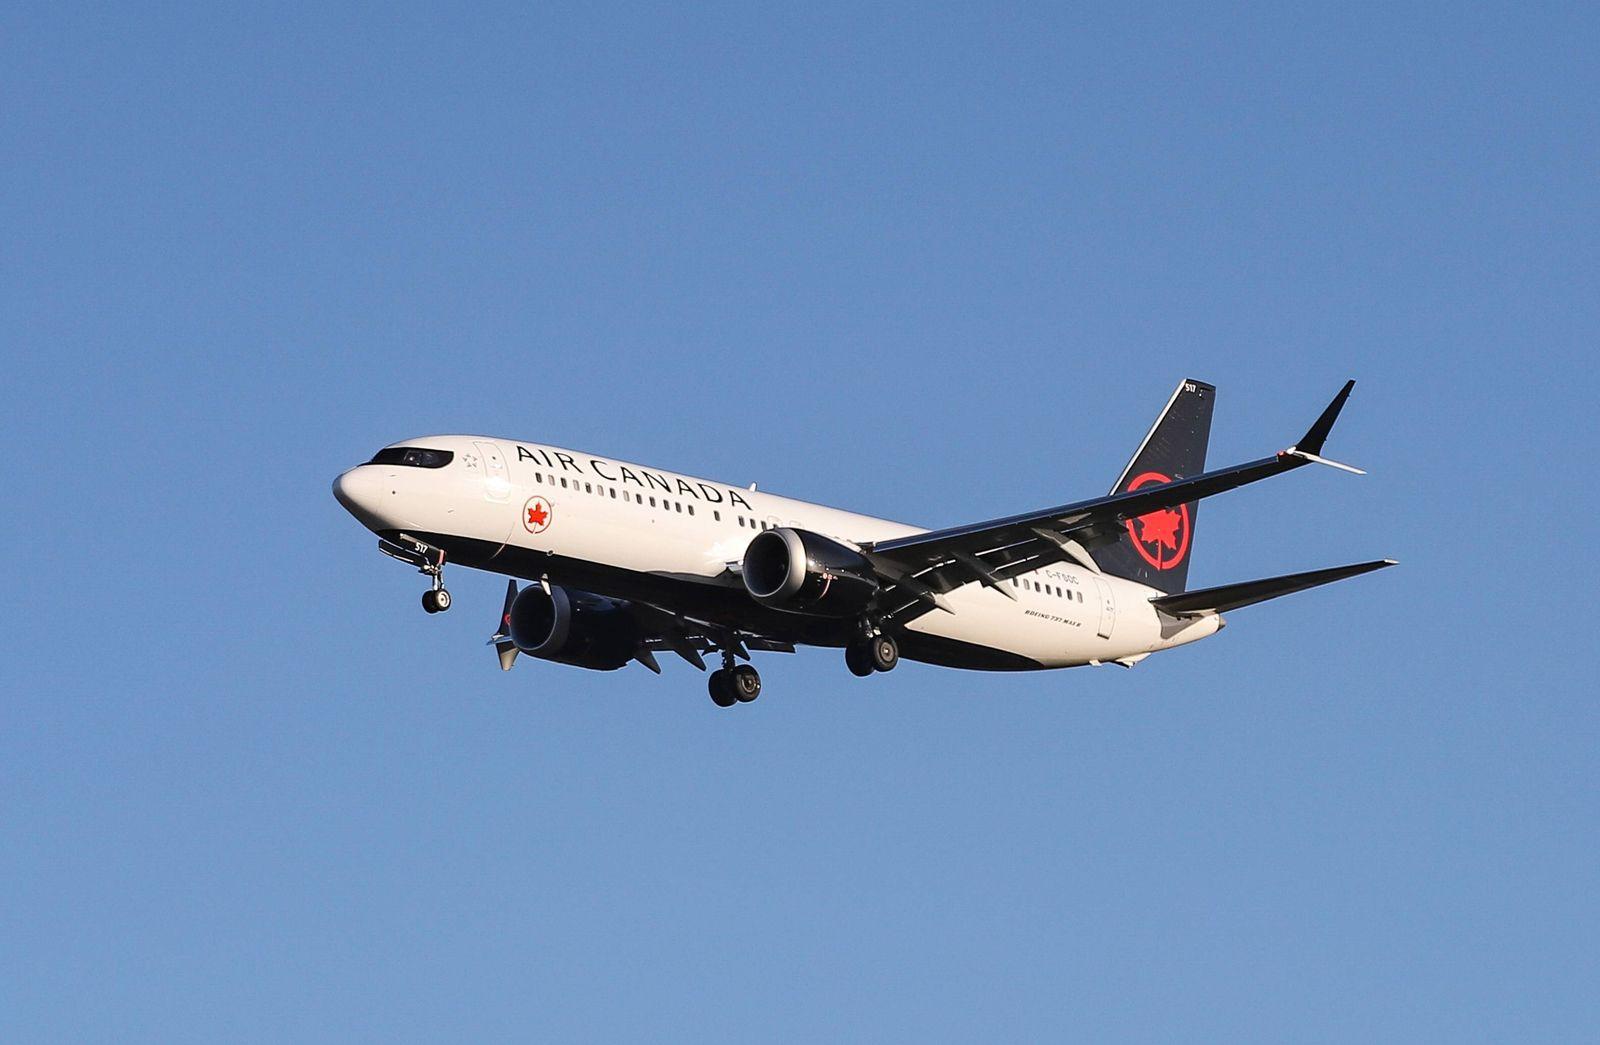 November 30, 2018 - London, England, United Kingdom - Air Canada Boeing 737 MAX 8 landing at London Heathrow Internation